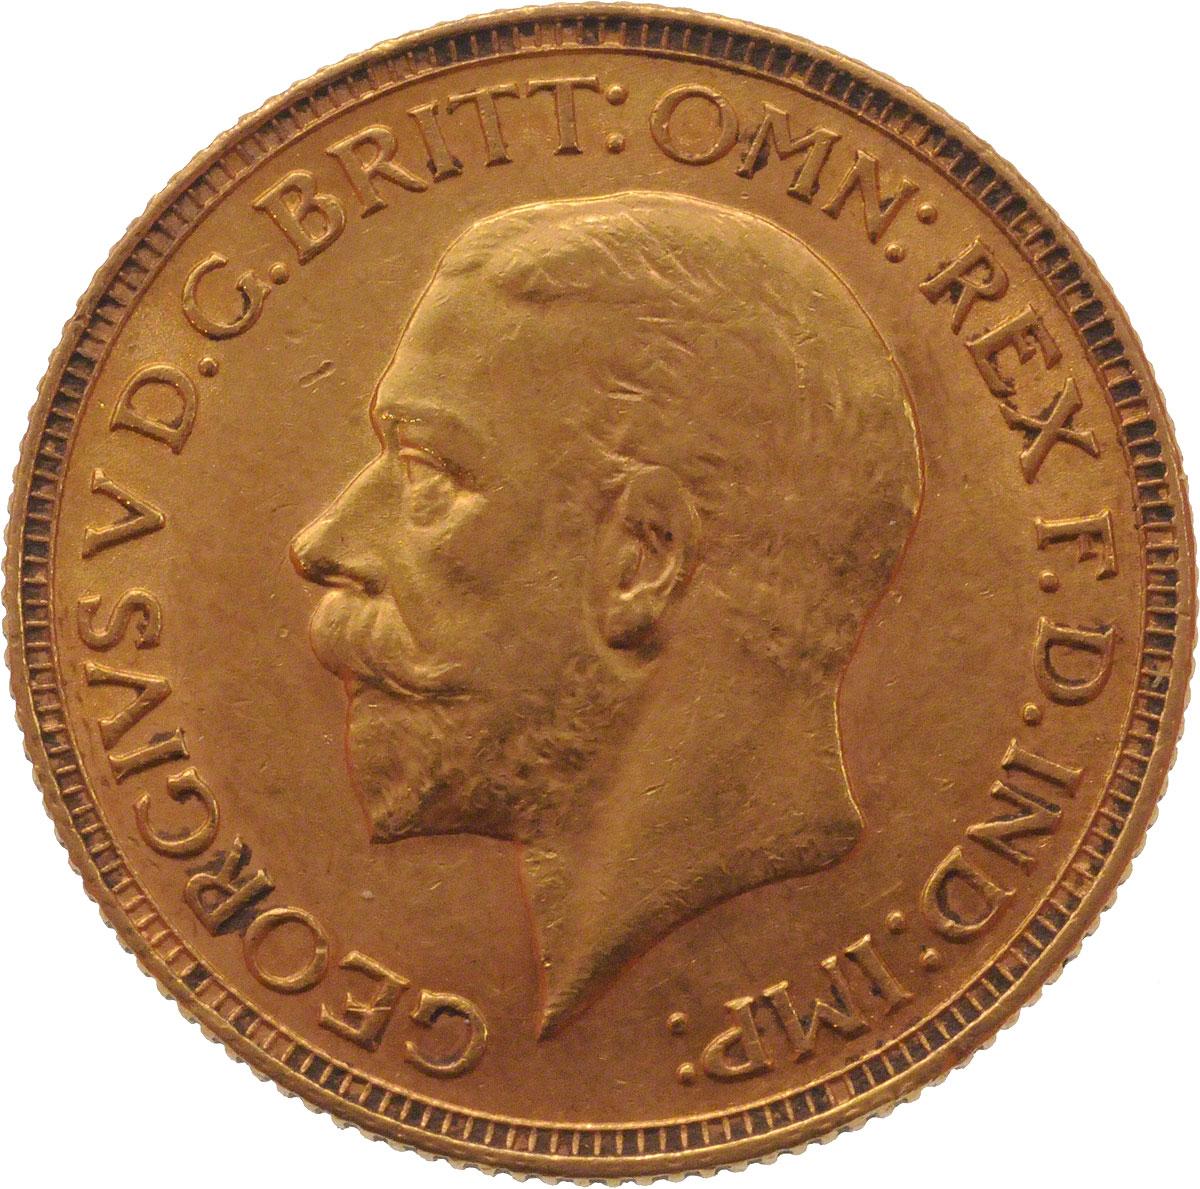 George V St George Pretoria South Africa Mint